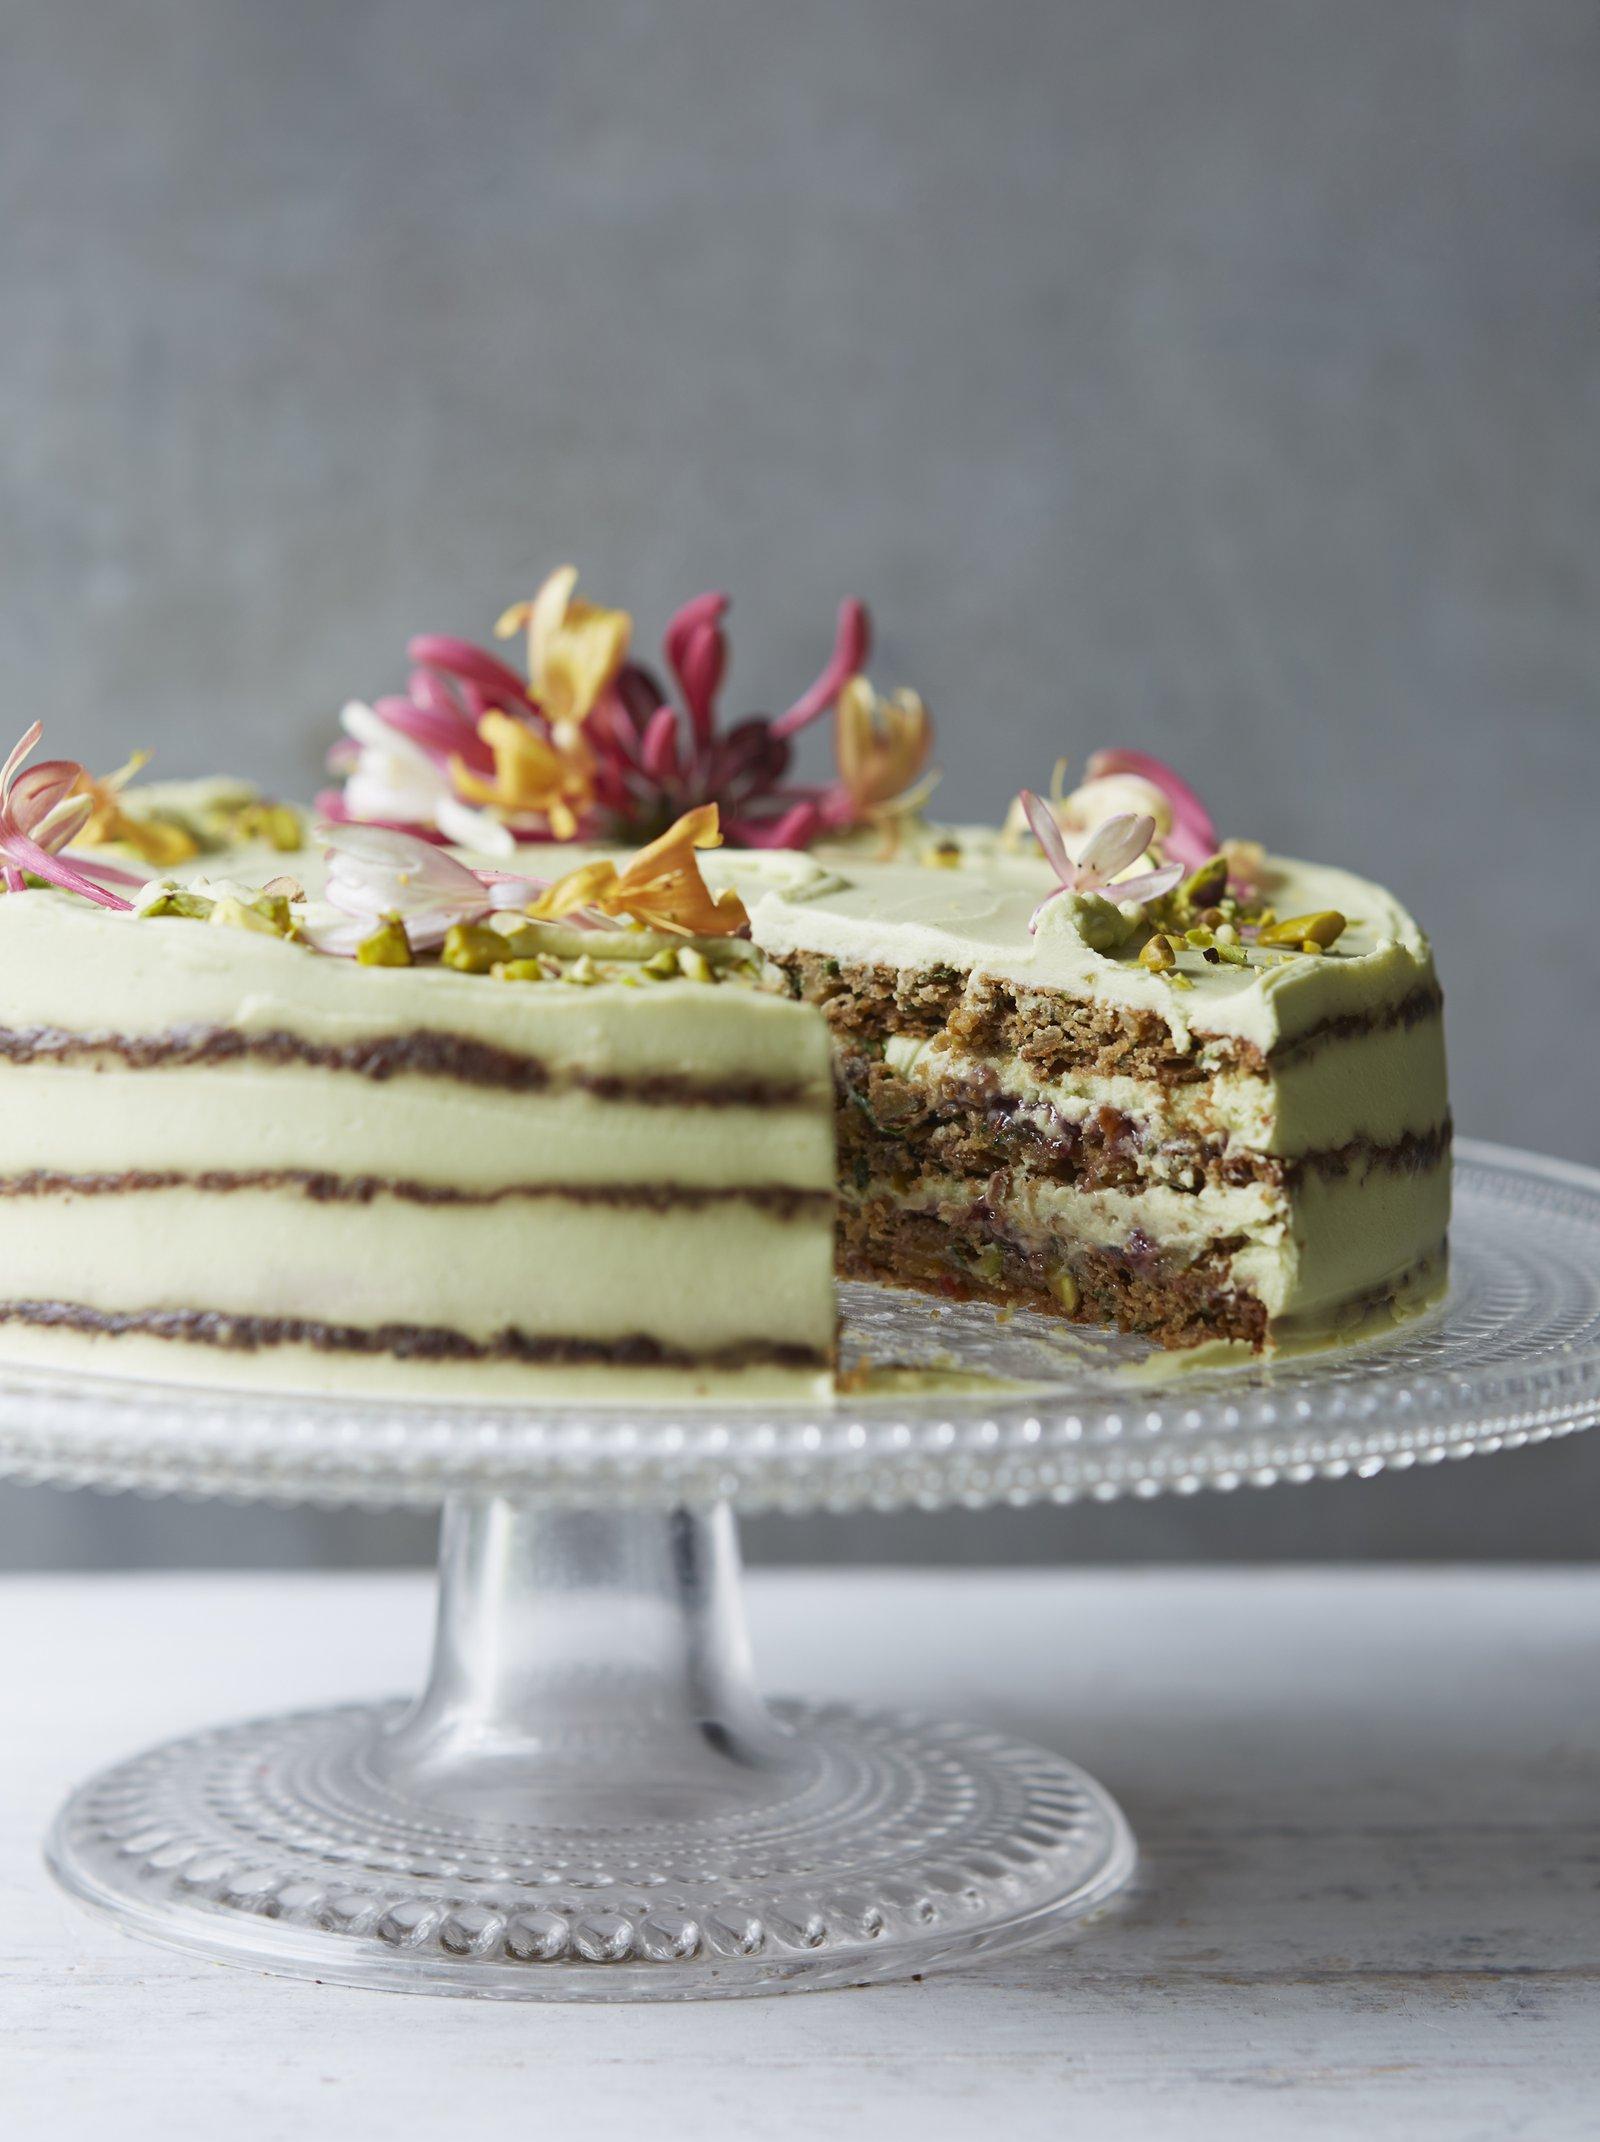 CC_Courgette Cake- Henrietta Inman